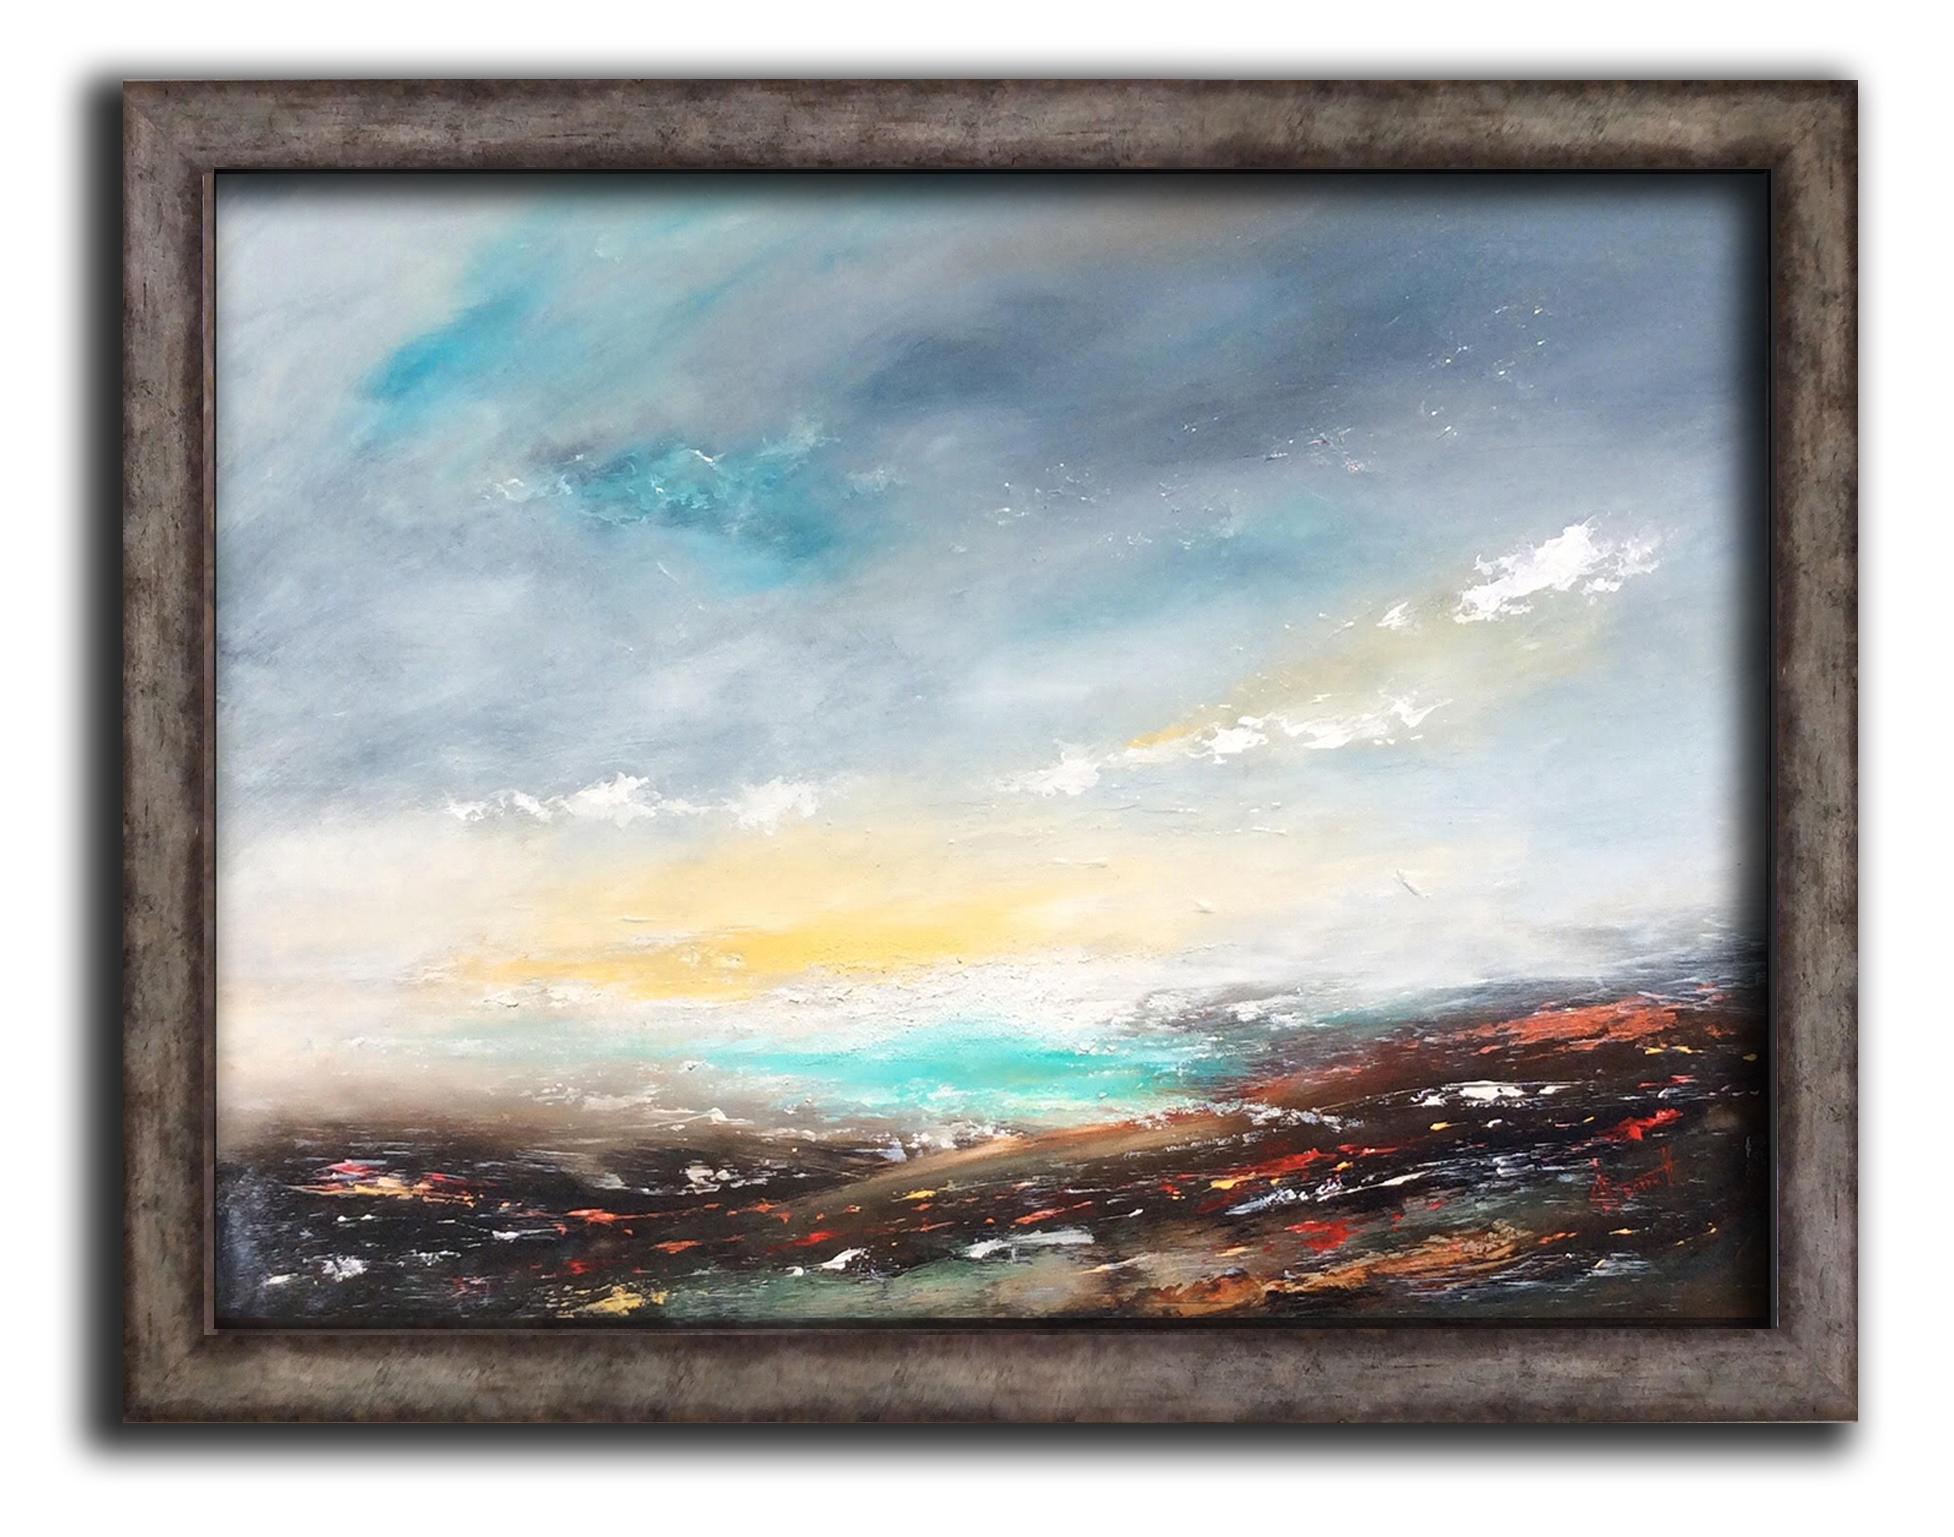 Azure Dawn 88 x 68 cm £700